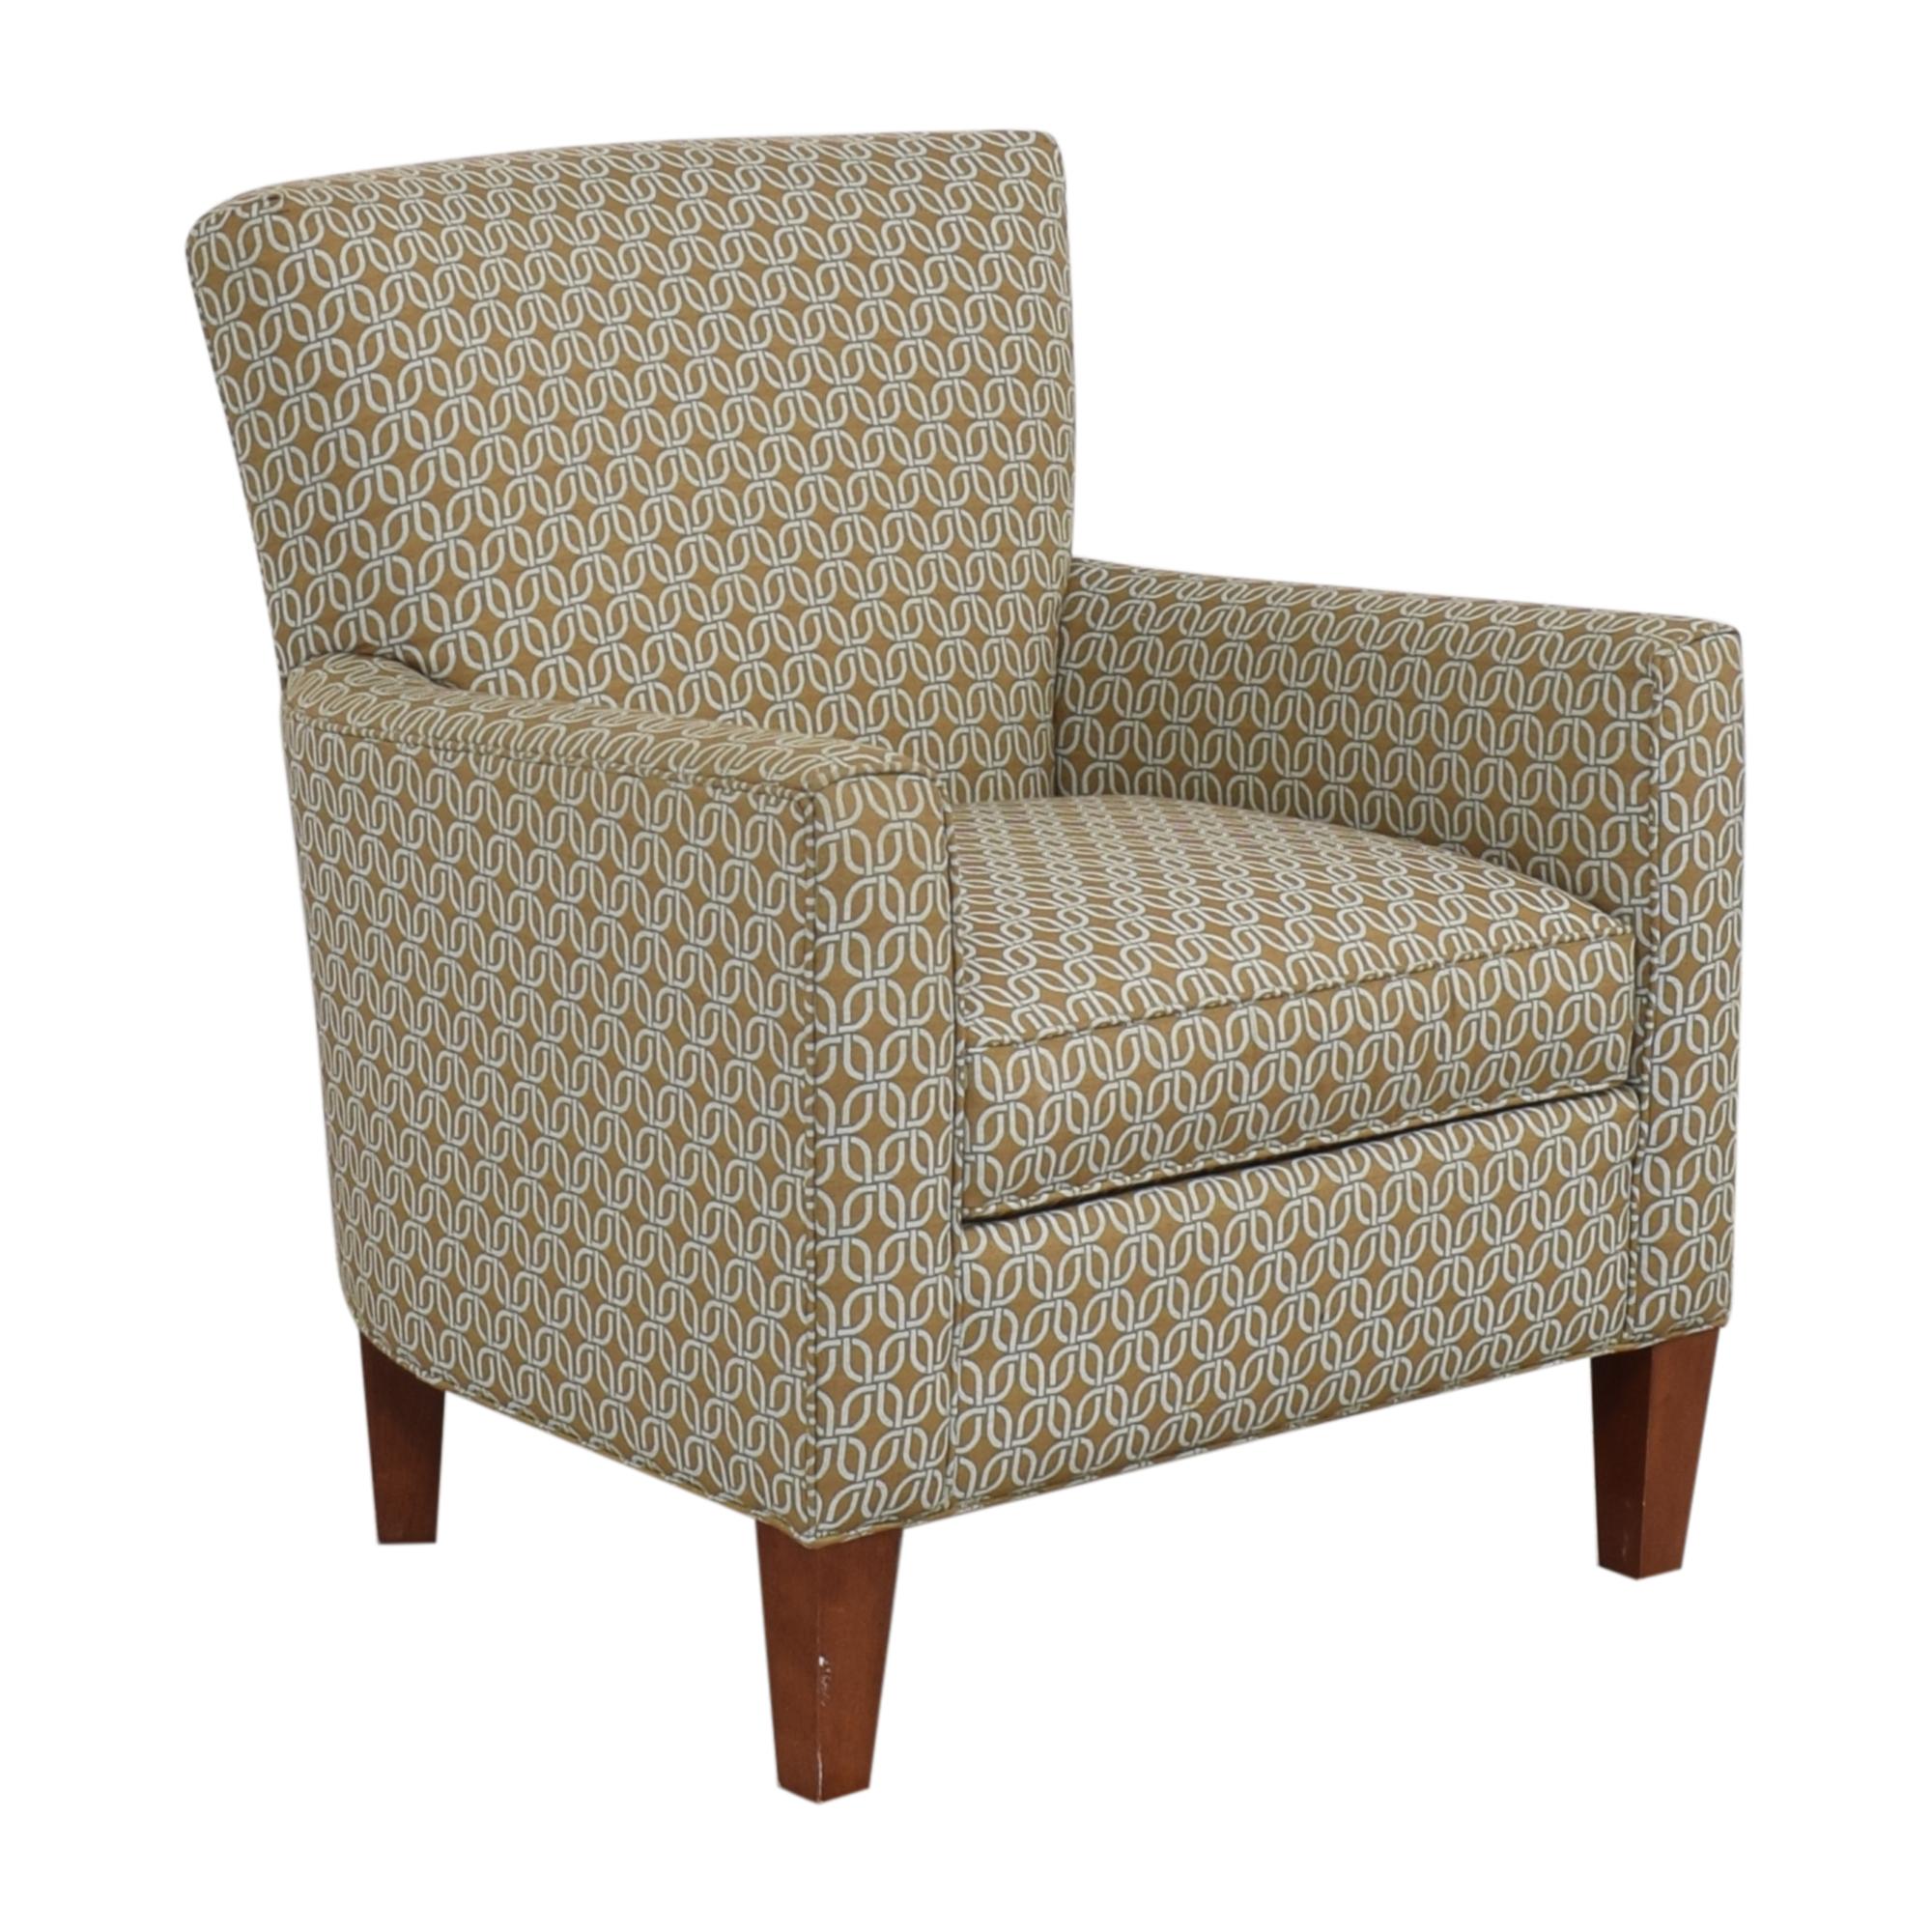 Ethan Allen Ethan Allen Custom Collin Chair for sale